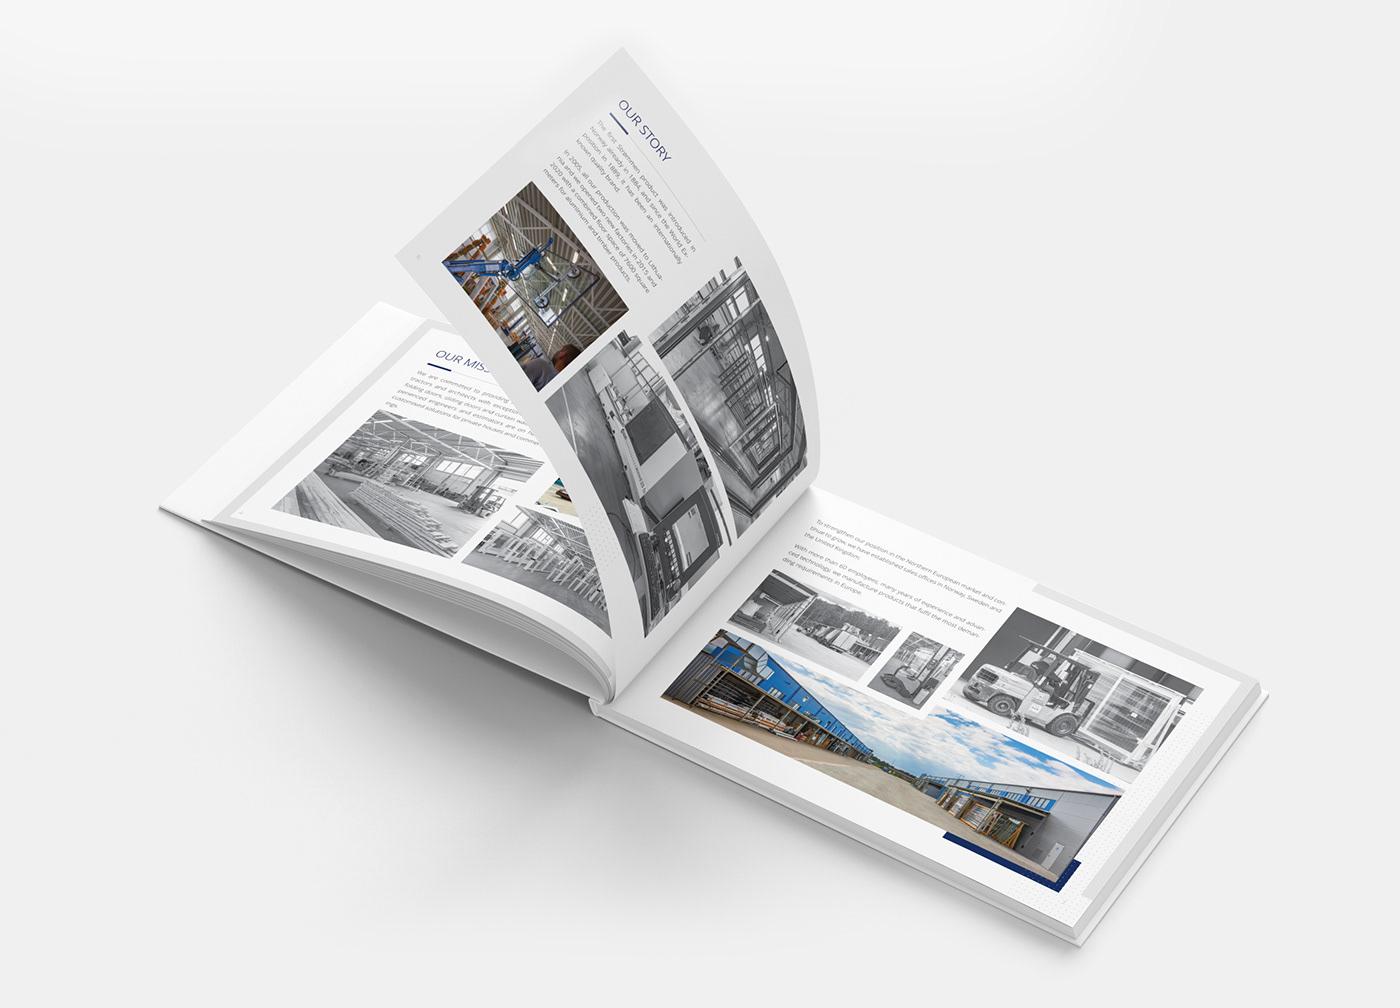 aliuslt blue catalog norway strommen windows alius brochure kaunas levinskas